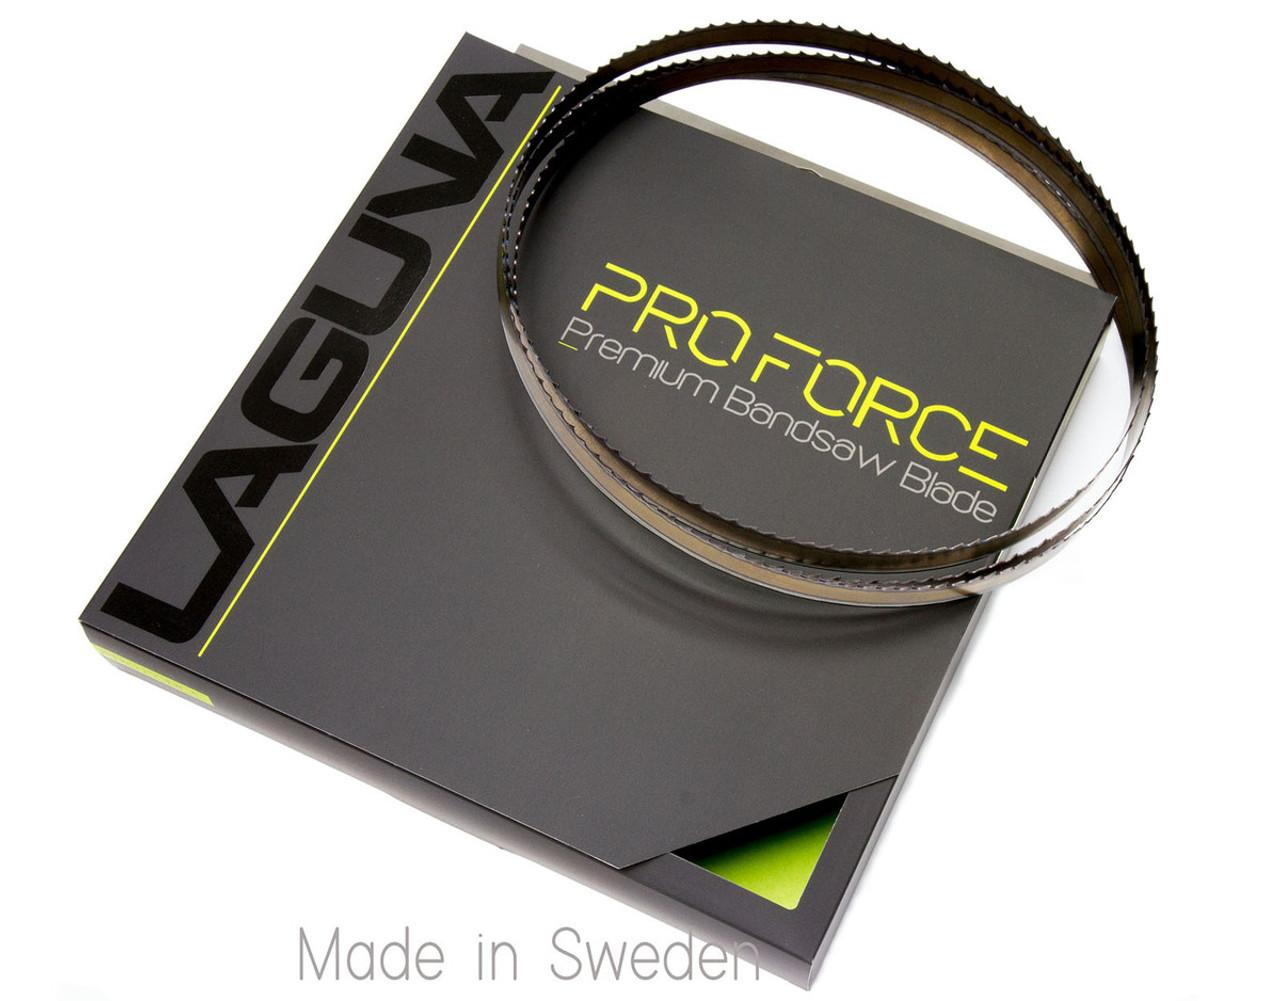 "Laguna Bandsaw Blade - Proforce 1/2"" 6TPI - 145"" (650434697316)"